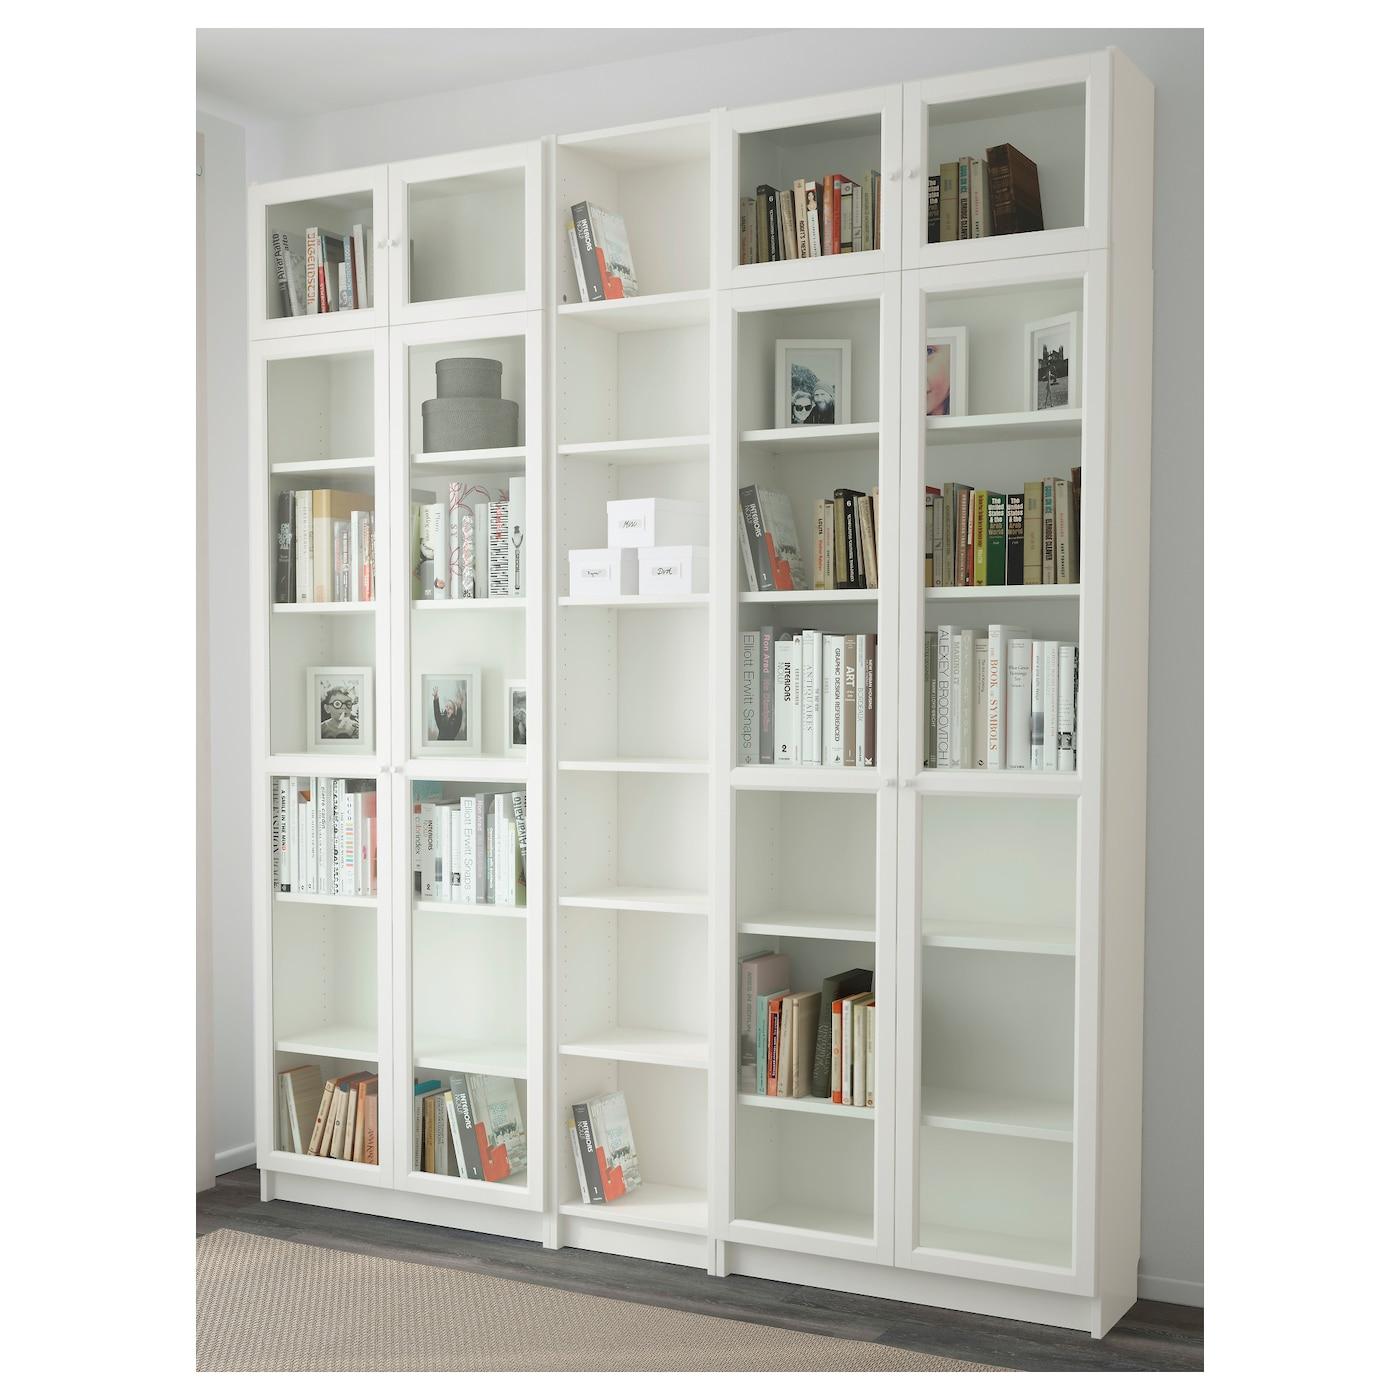 Billy oxberg bookcase white 200x237x30 cm ikea for Small white bookcase ikea